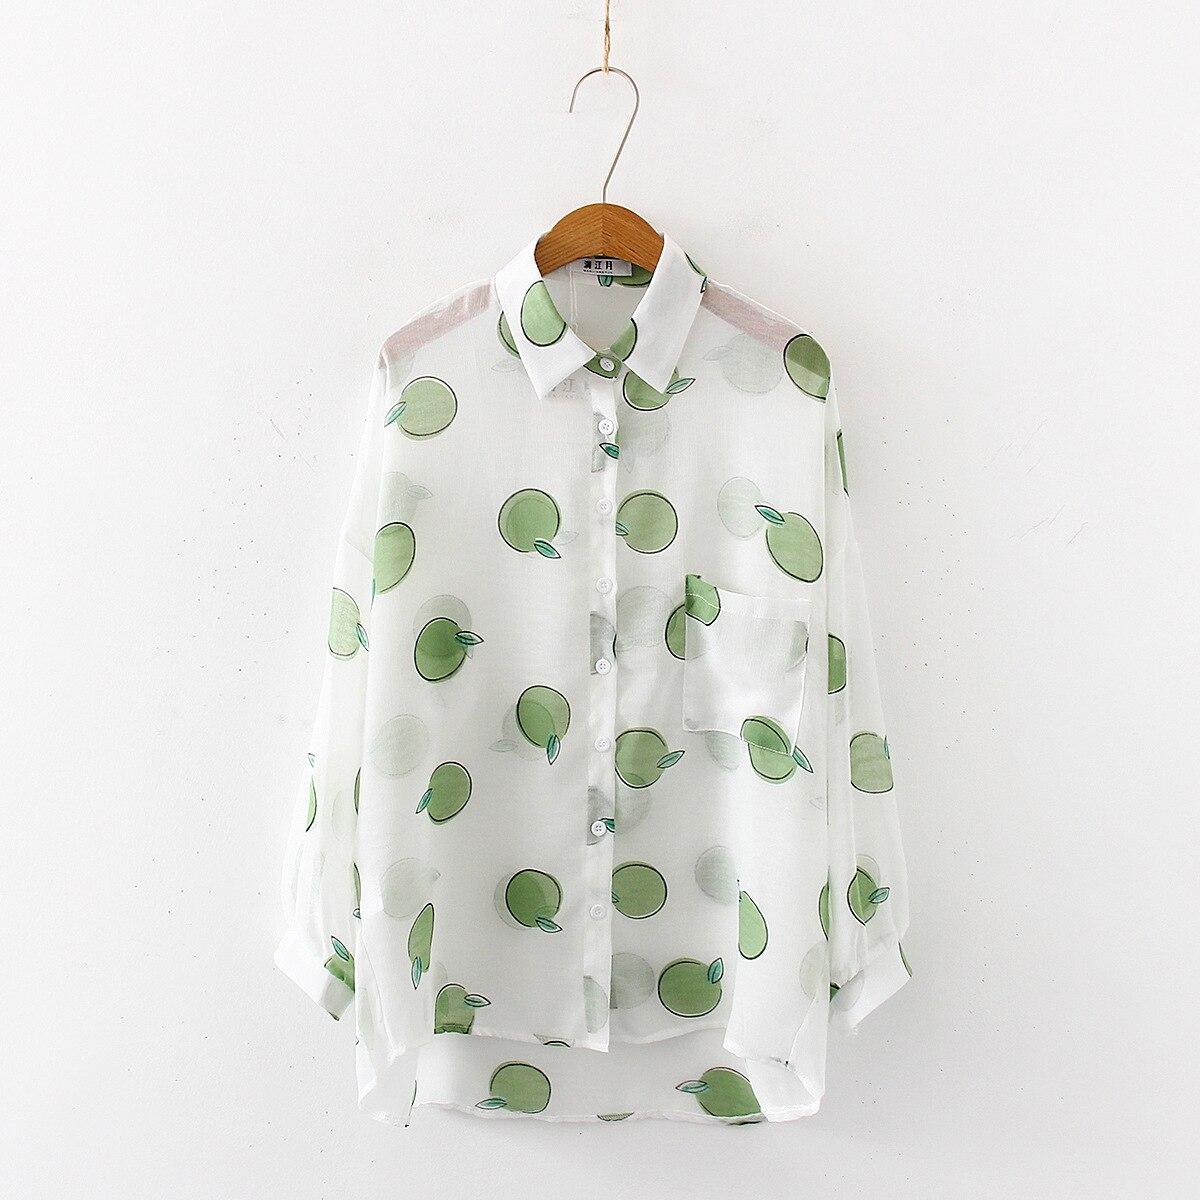 2019 New Women Fasihon Long Sleeve Sweet Lemon Printed Loose Cotton Blouses Shirts Summer Casual Office Shirt Tops Blusas